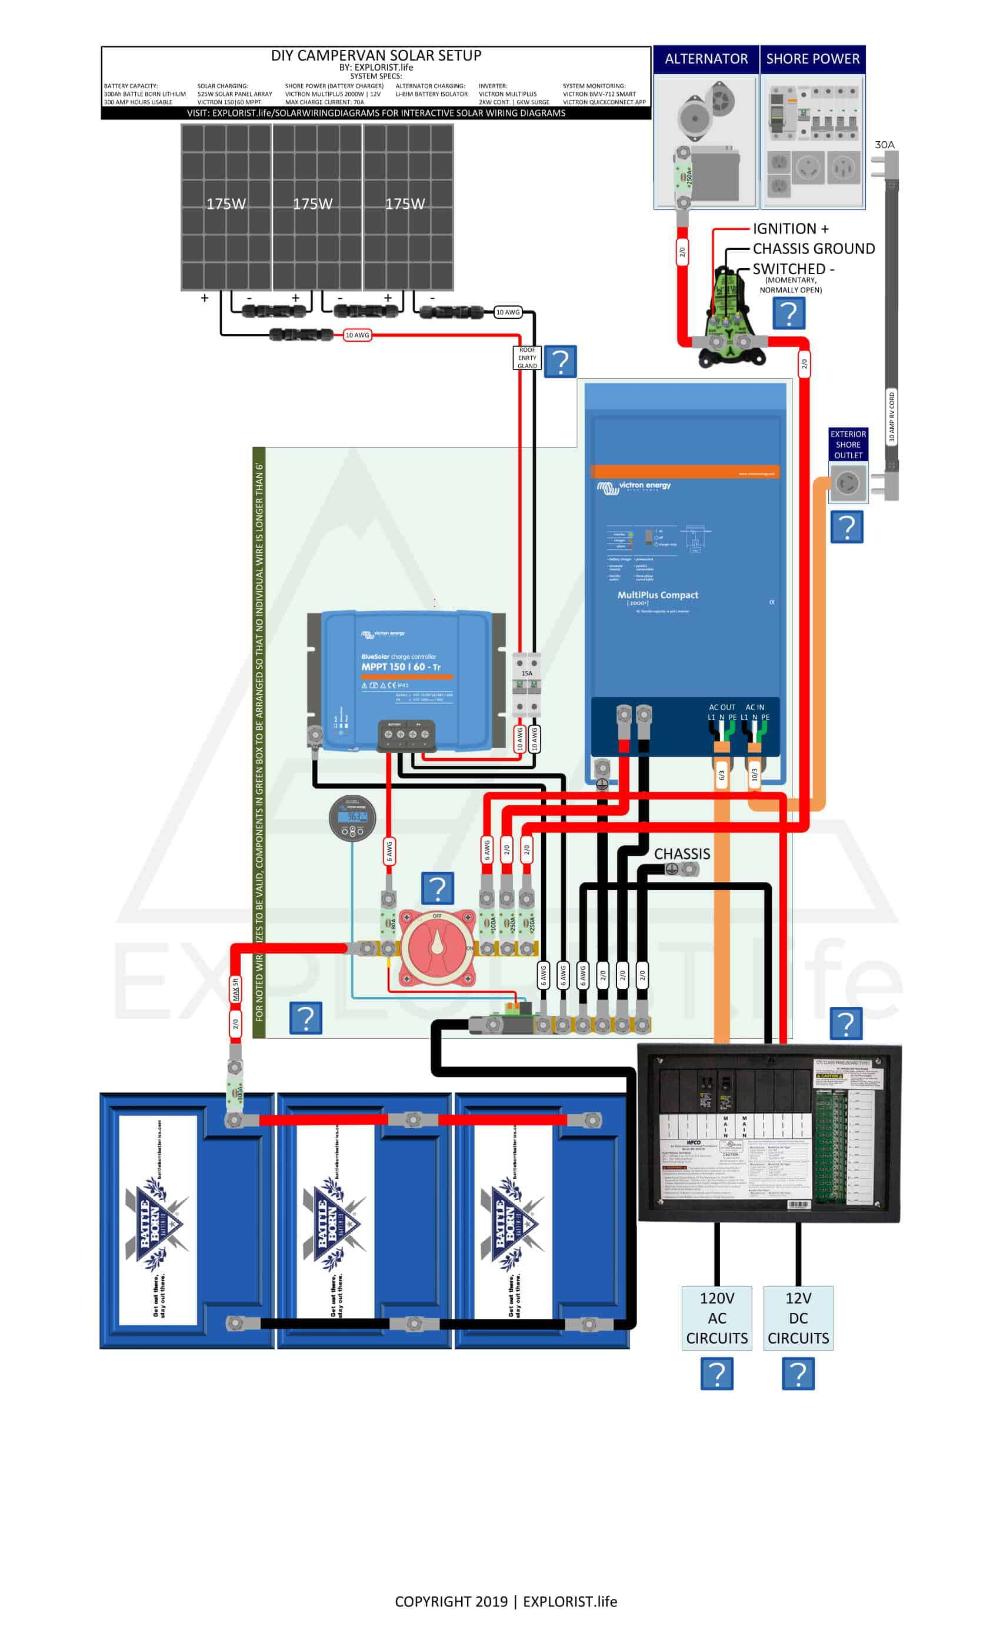 300ah Lithium Battery Bank 3x175w Solar 2kw Inverter Charger Li Bim Alternator Charging Explorist Life Solar Panels Diy Solar Solar Power